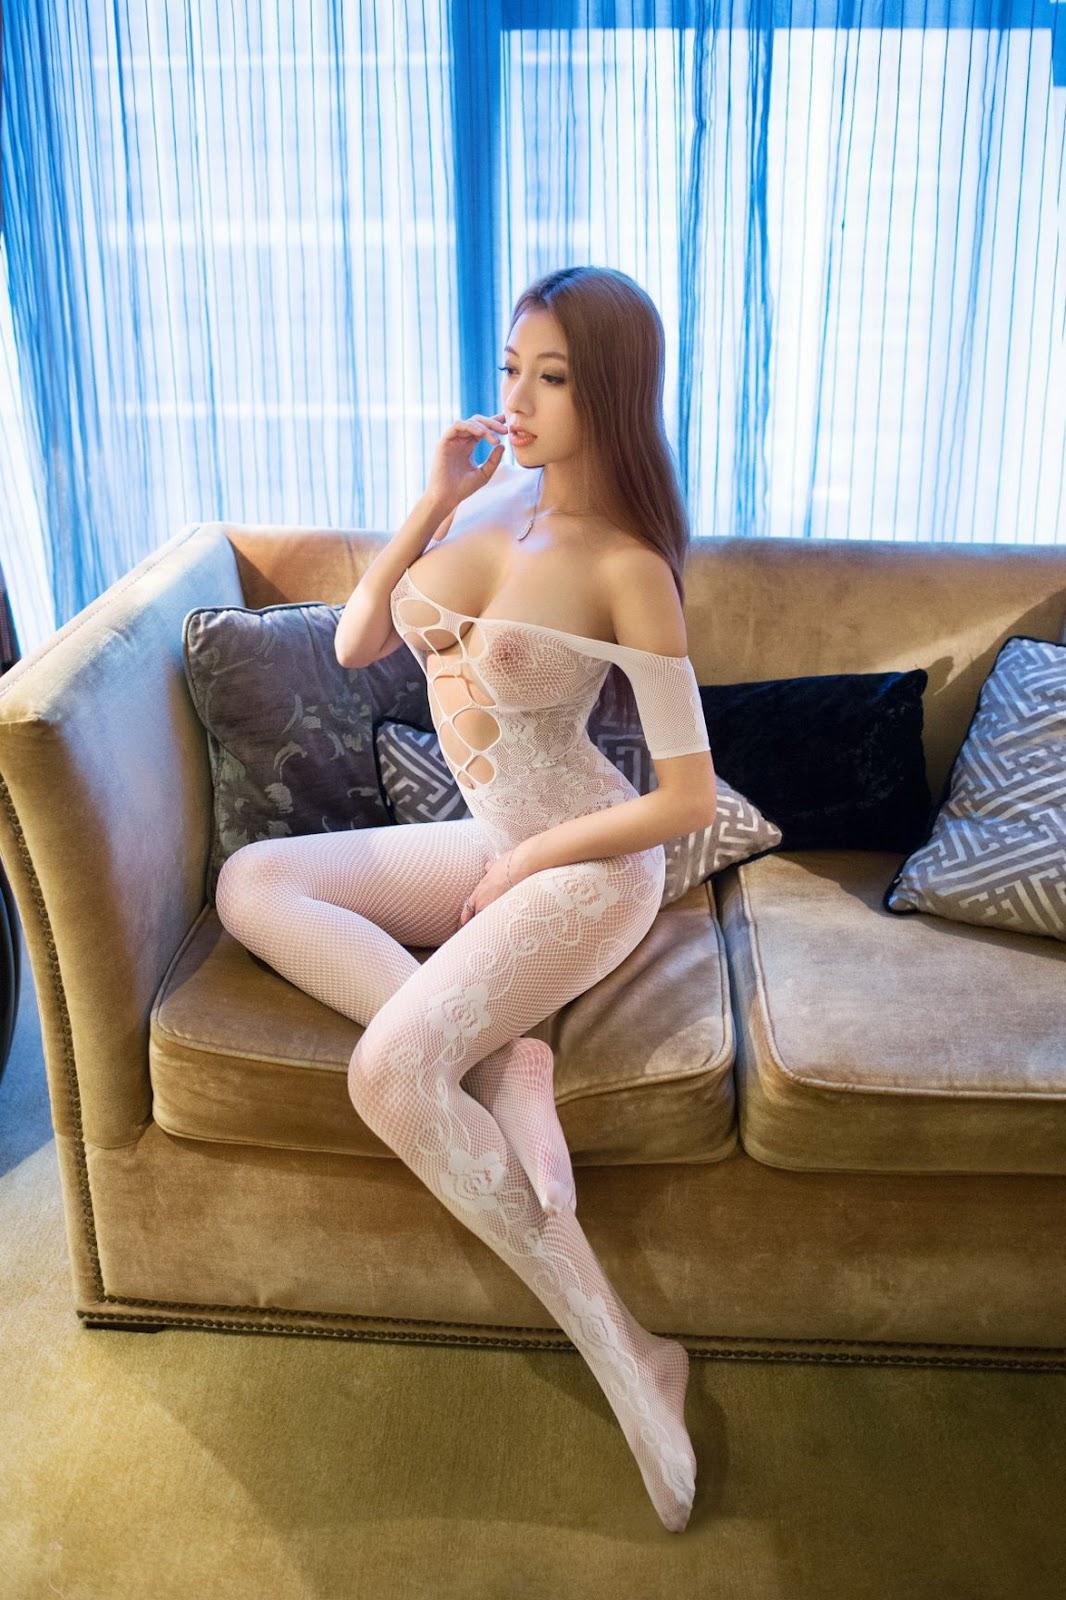 48%2B%252814%2529 - Sexy Girl Nude TUIGIRL NO.48 Model